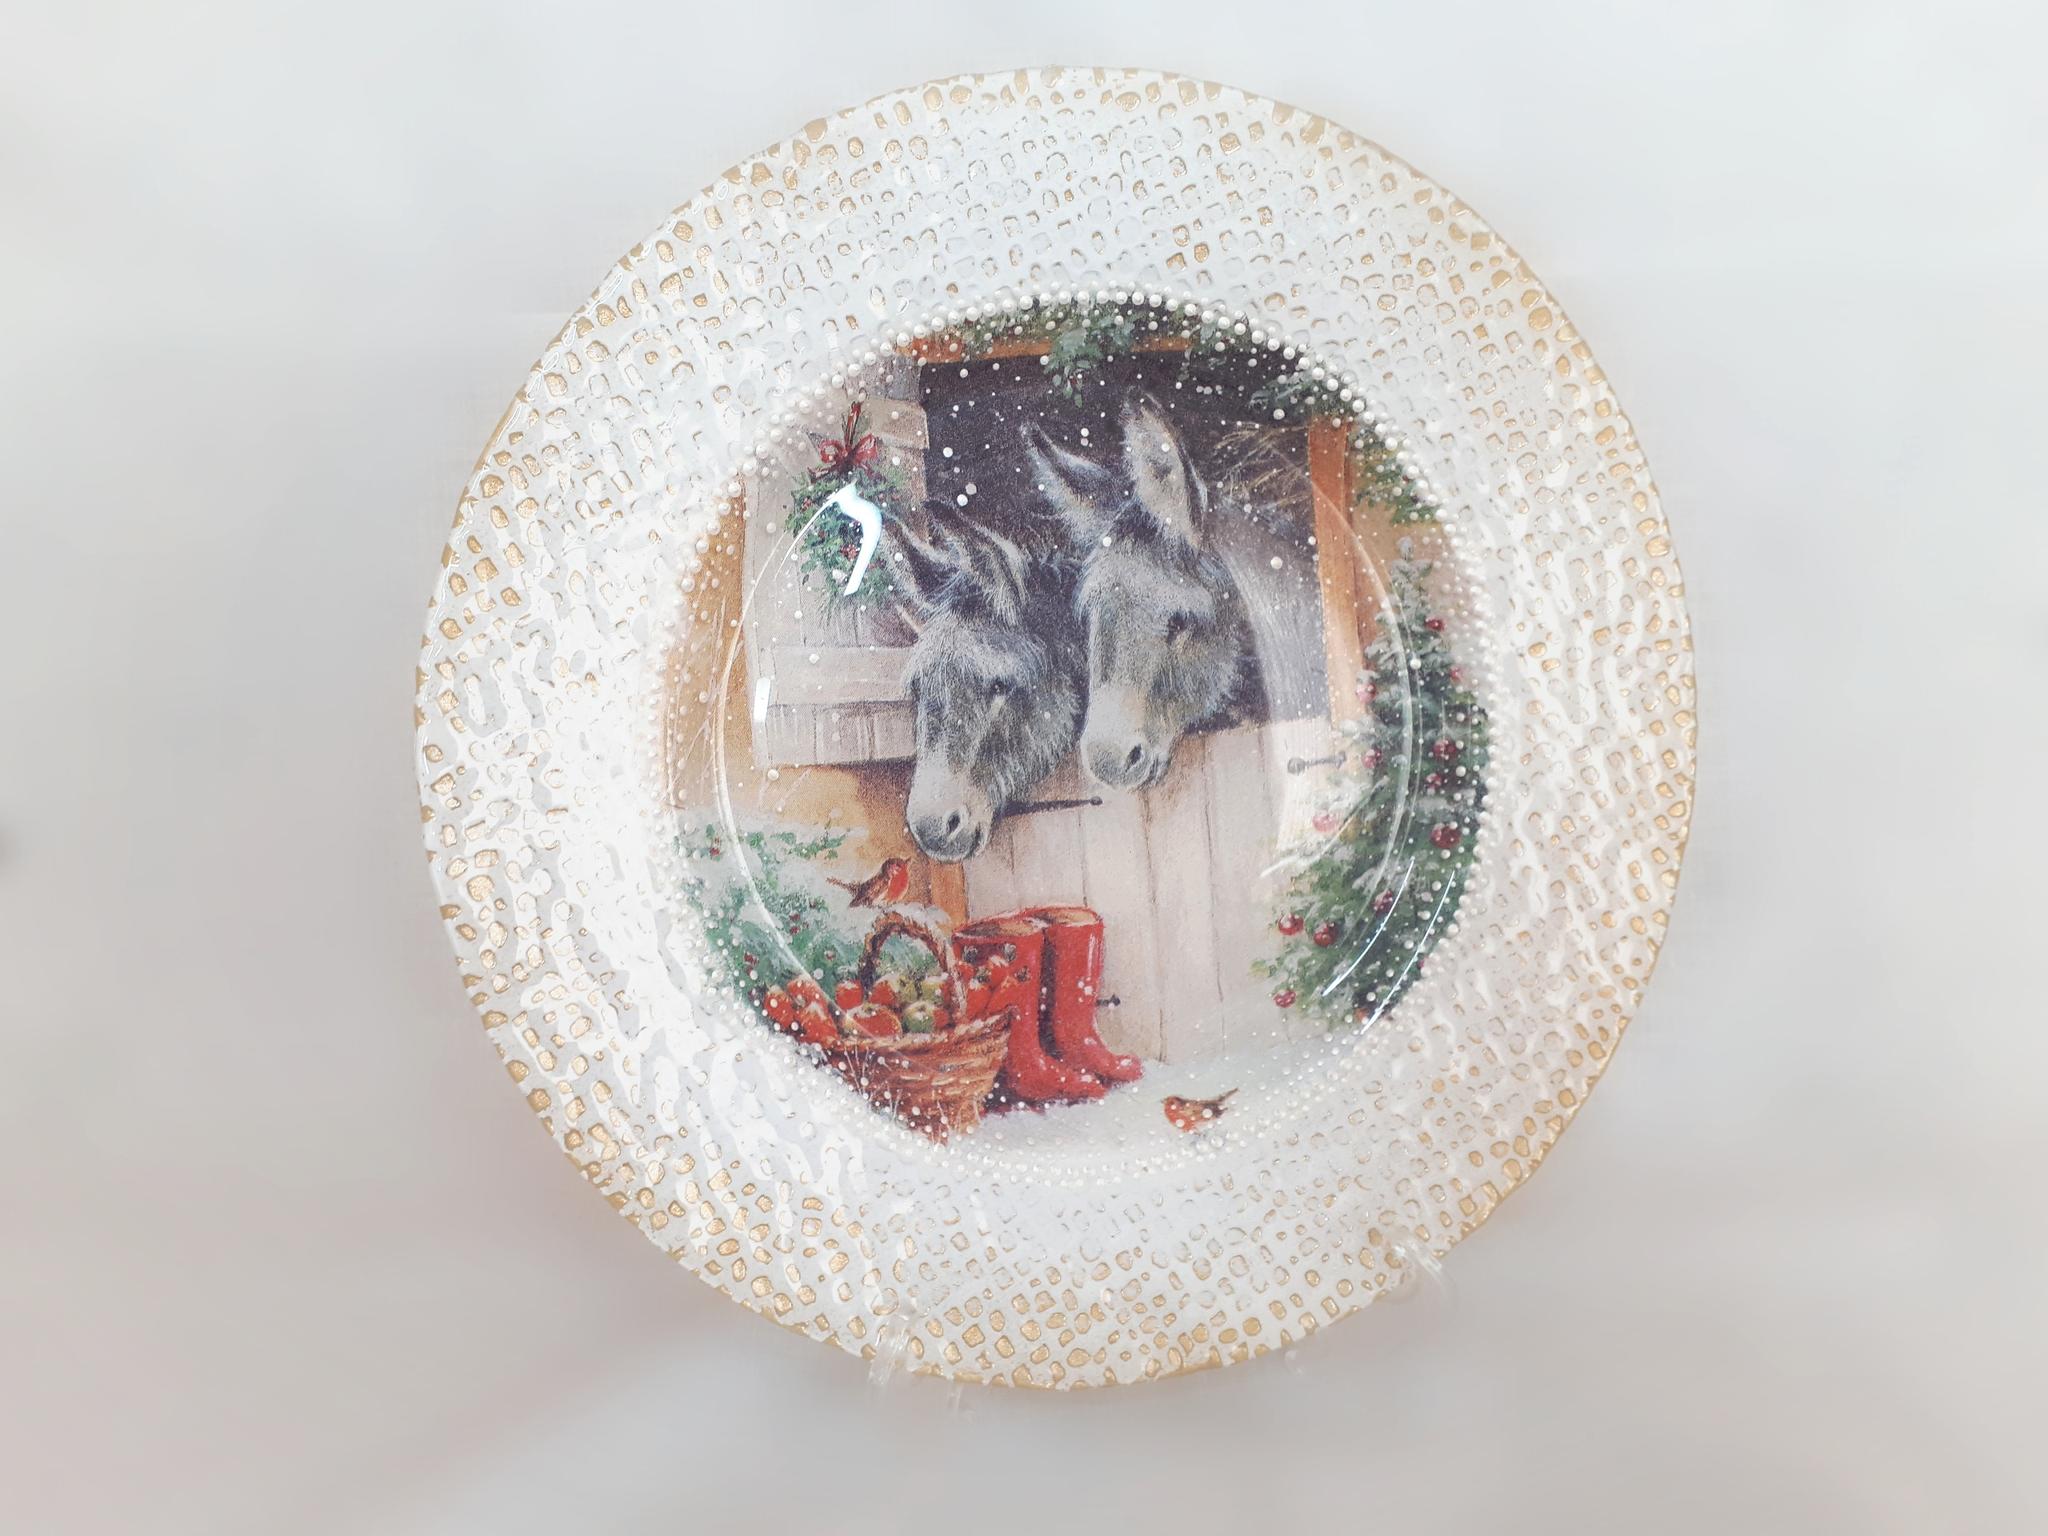 Мастер-класс «Сувенирная тарелка»